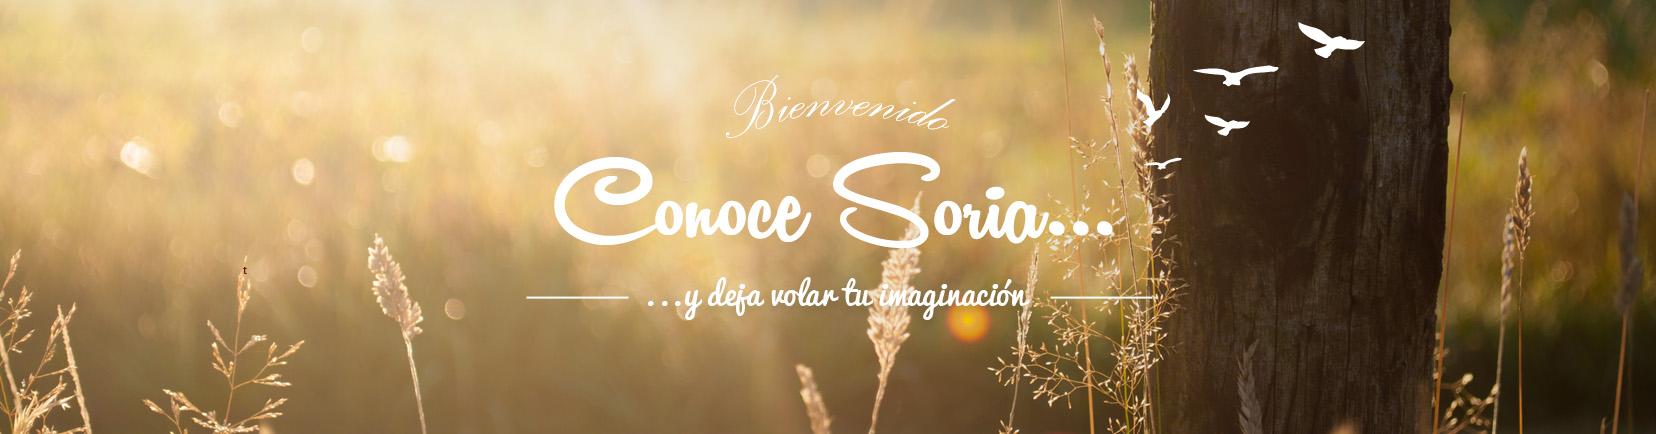 slide-1-conoce-soria-turismo-en-soria